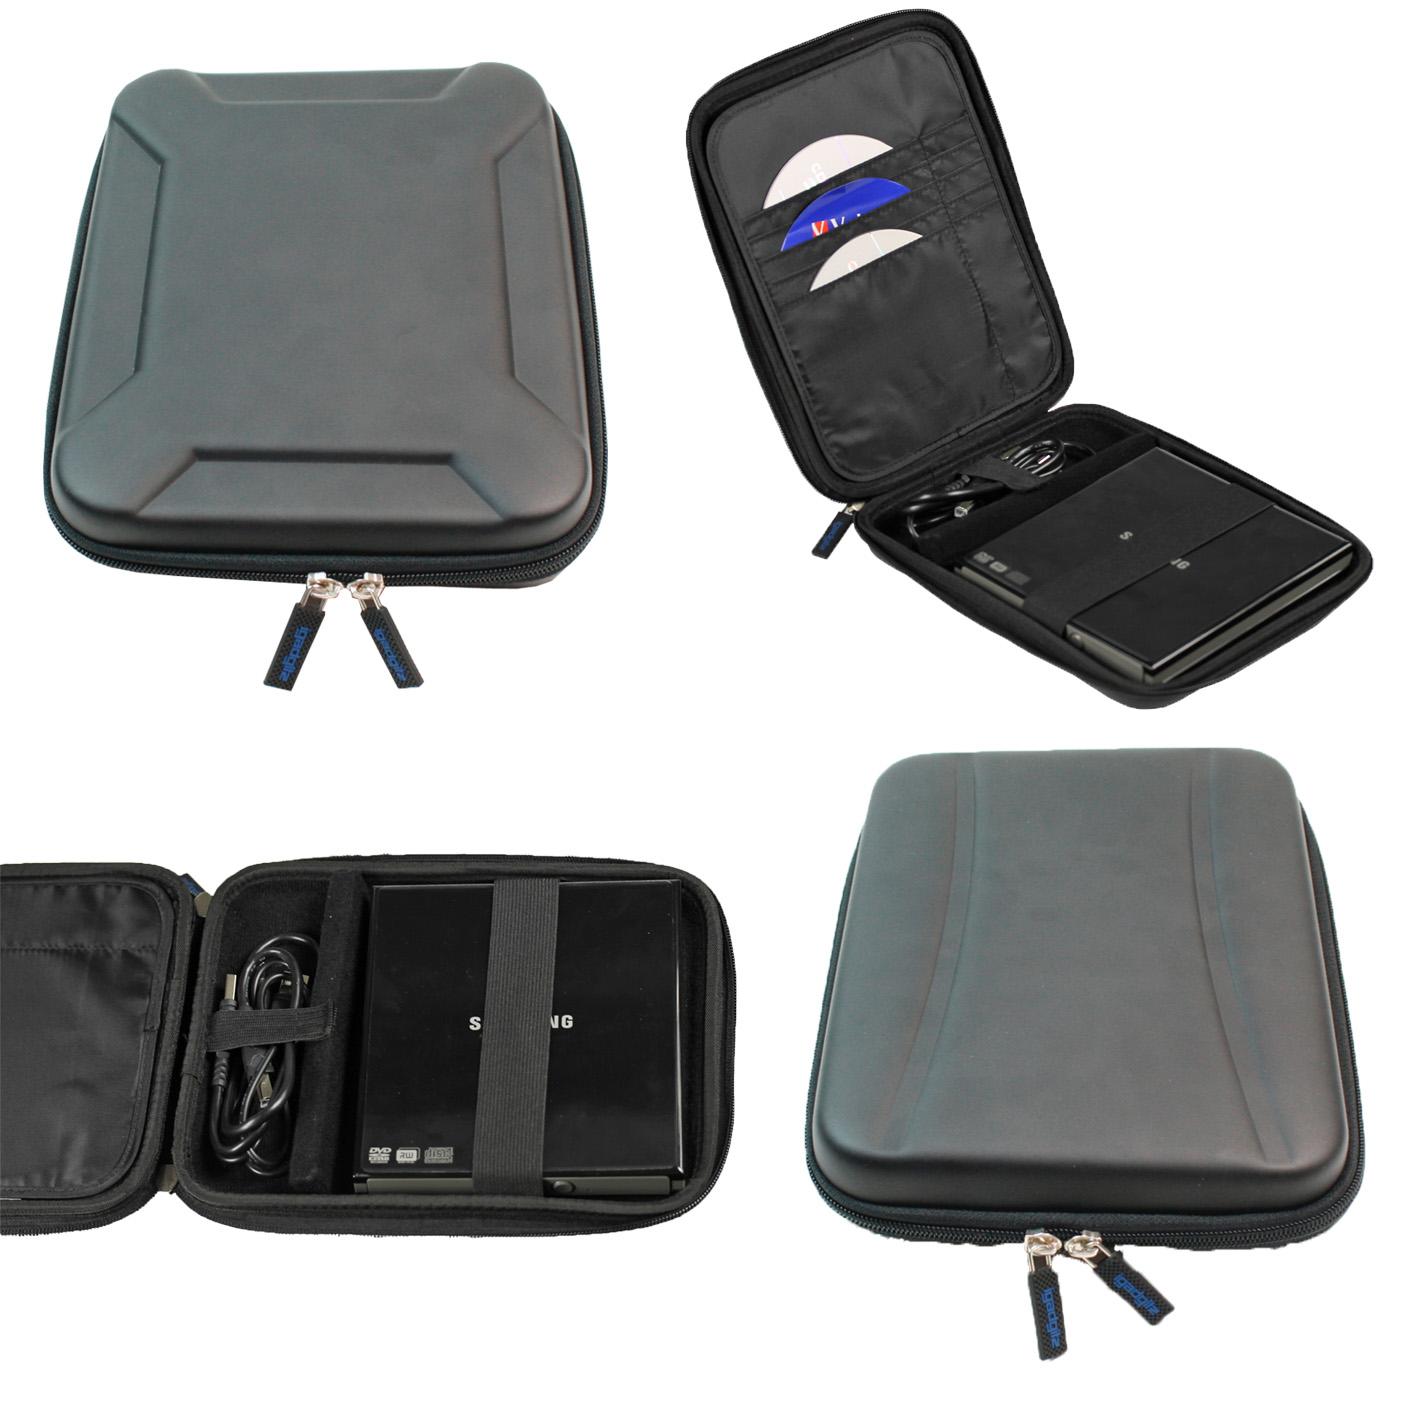 iGadgitz Black EVA Travel Hard Case Cover Sleeve for External DVD CD Blu-Ray Rewriter / Writer